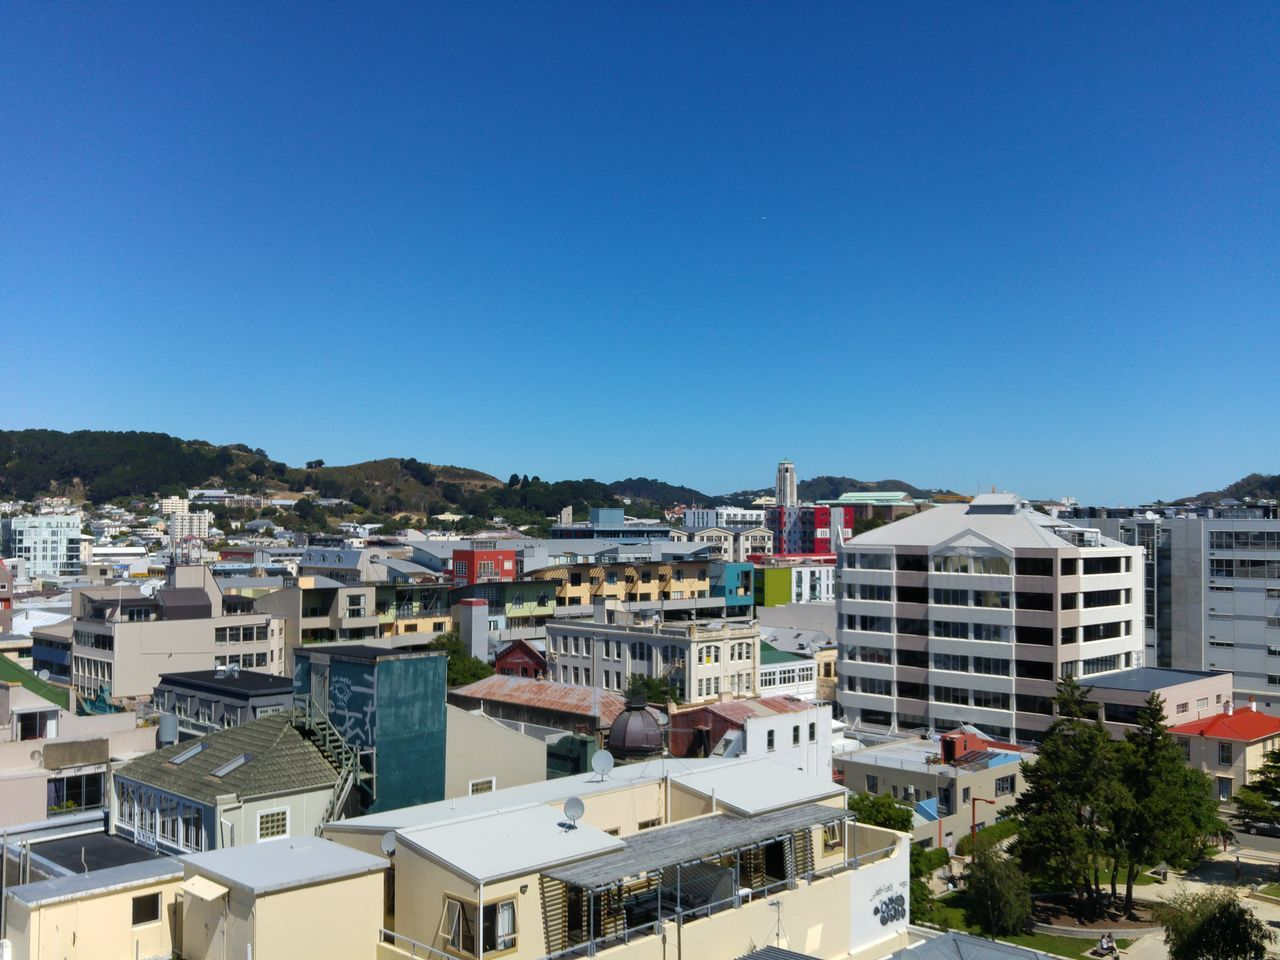 CBD Wellington Wellington Nz Blue Sky The Architect - 2016 EyeEm Awards